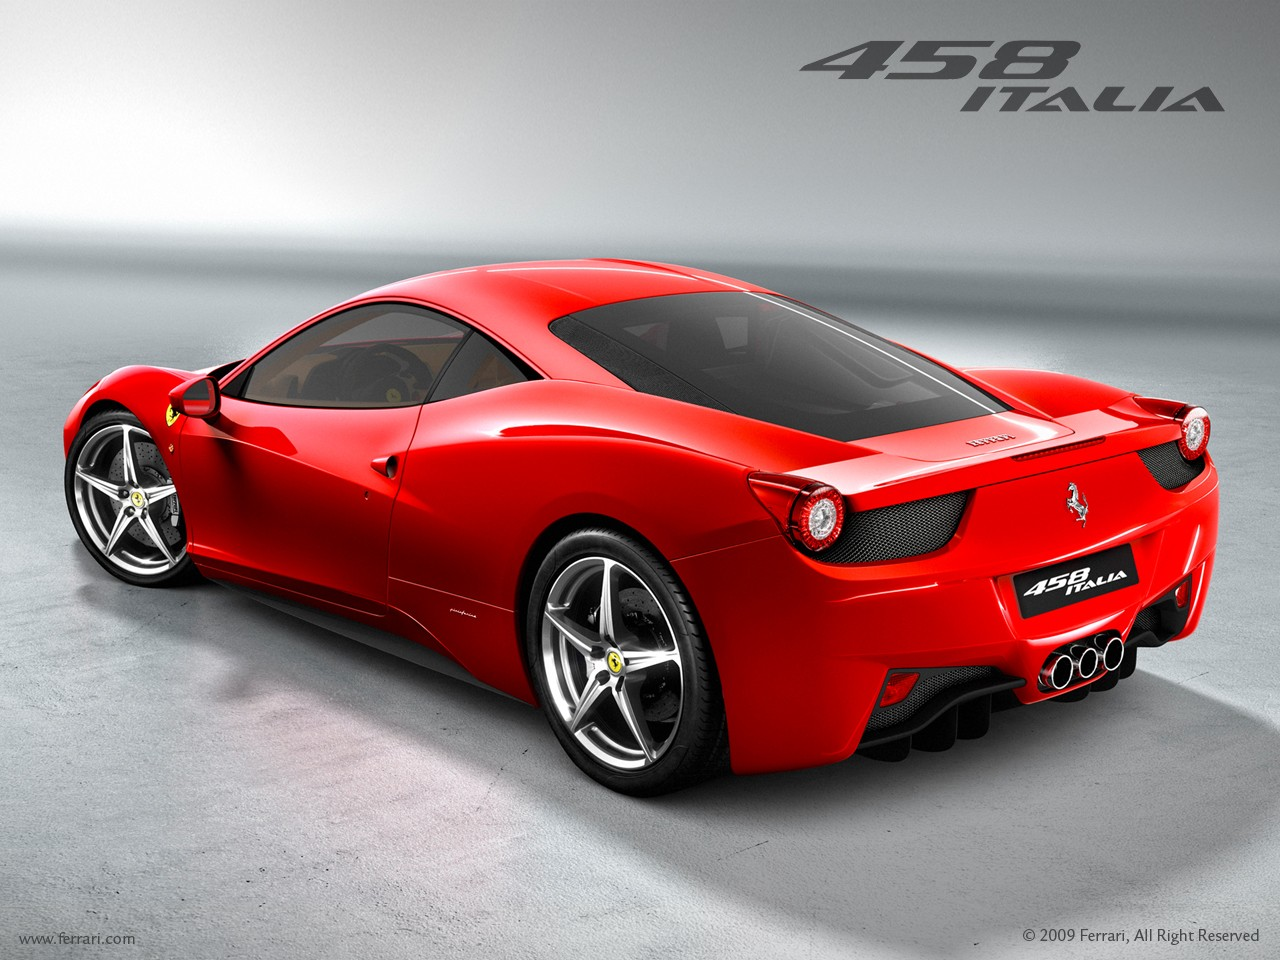 Big Ferrari 458 Italia Galerie photo World Cars Wallpapers Download